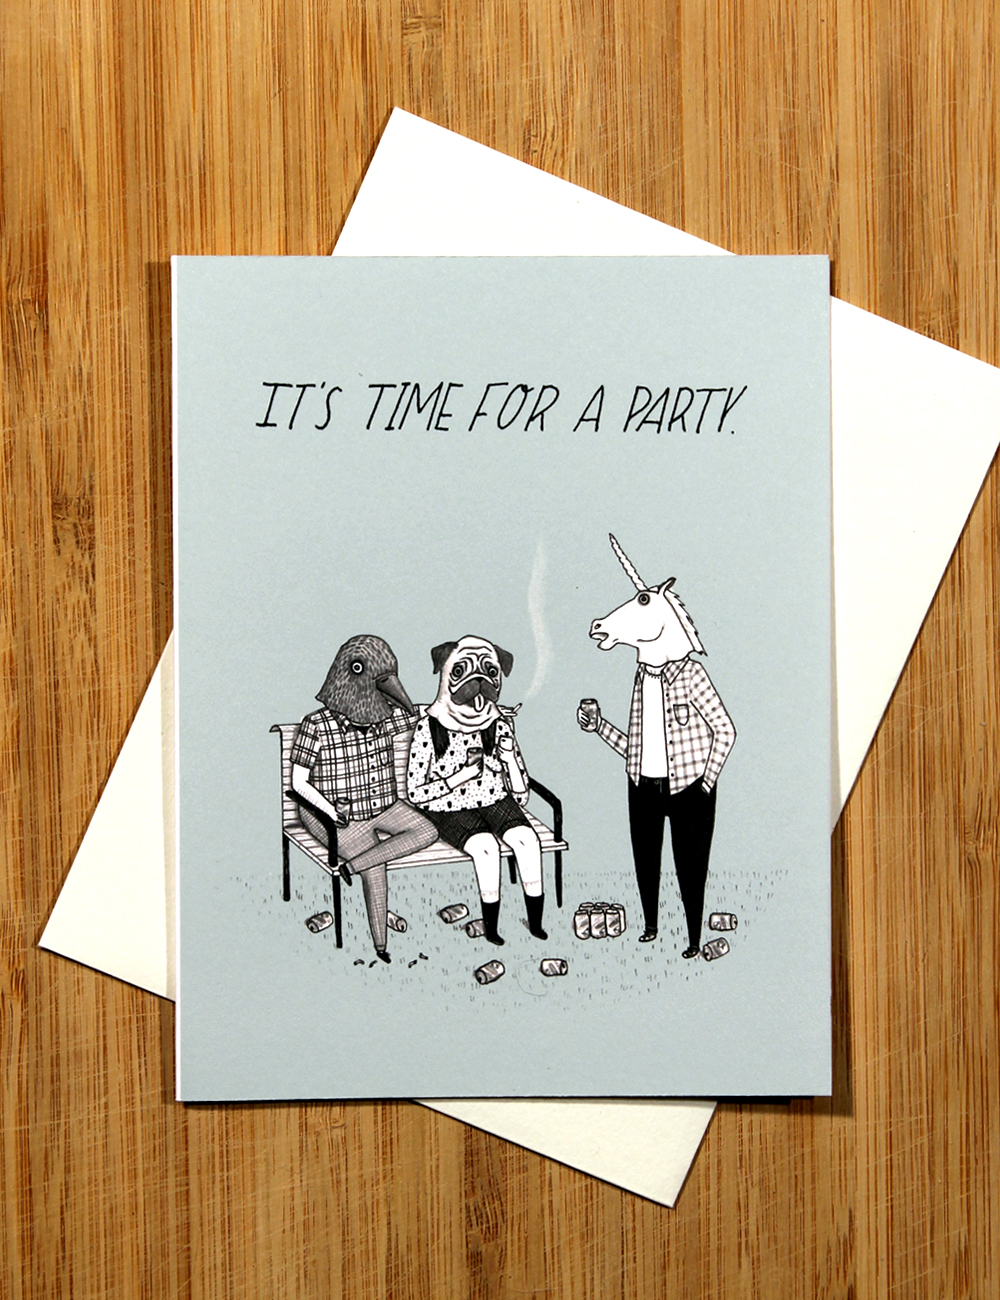 Partytimecard.jpg